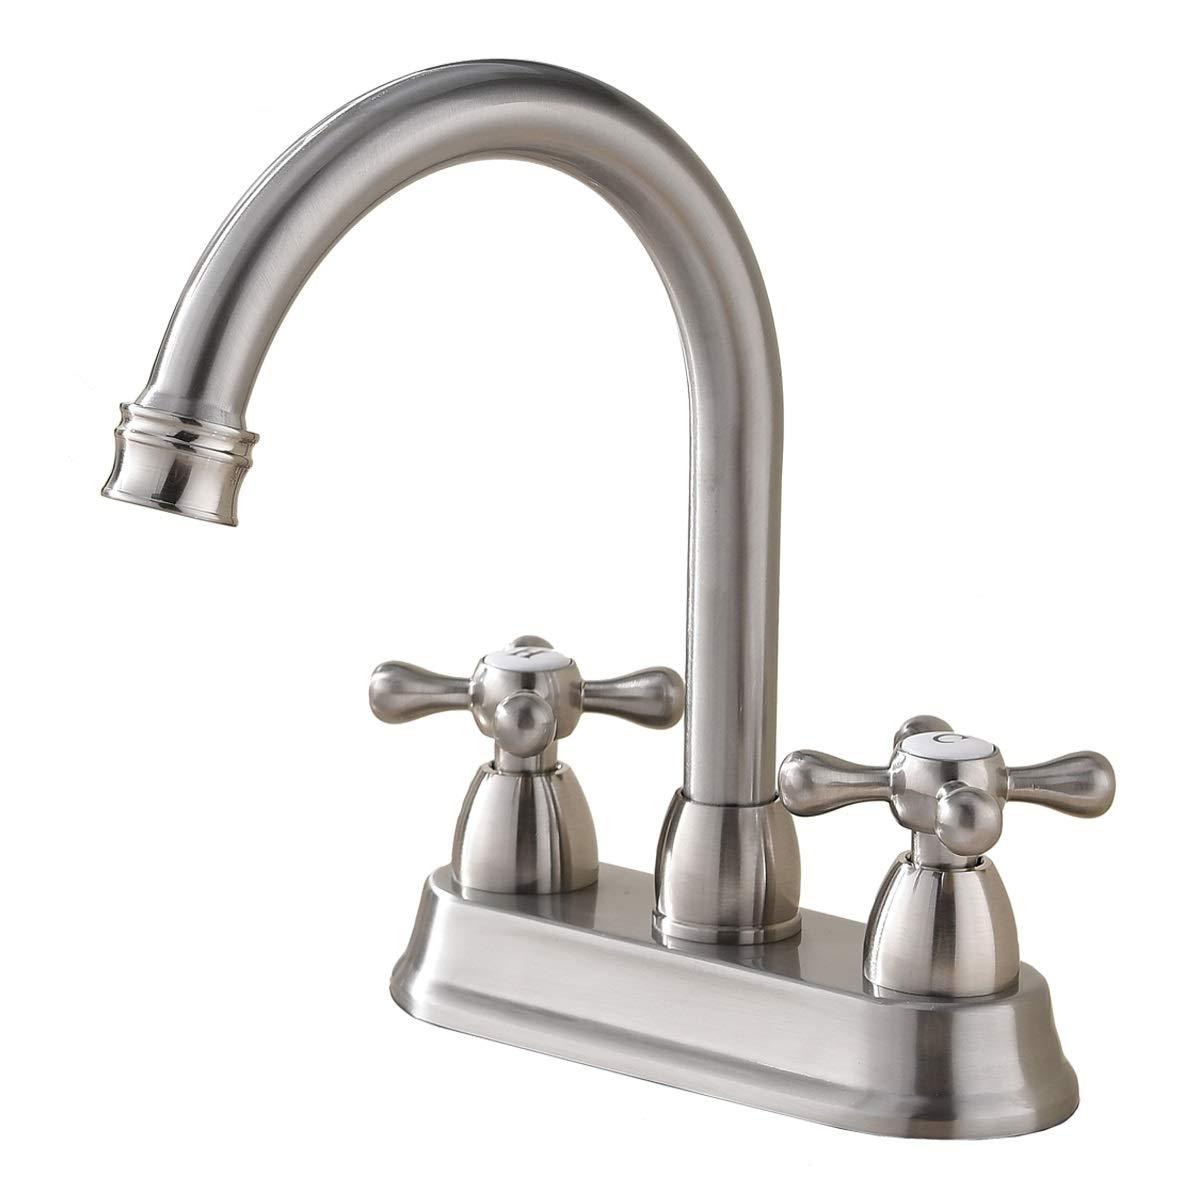 Best Commercial Brushed Nickel 2 Handle Centerset bathroom faucet, Stainless Steel Bathroom Sink Faucet